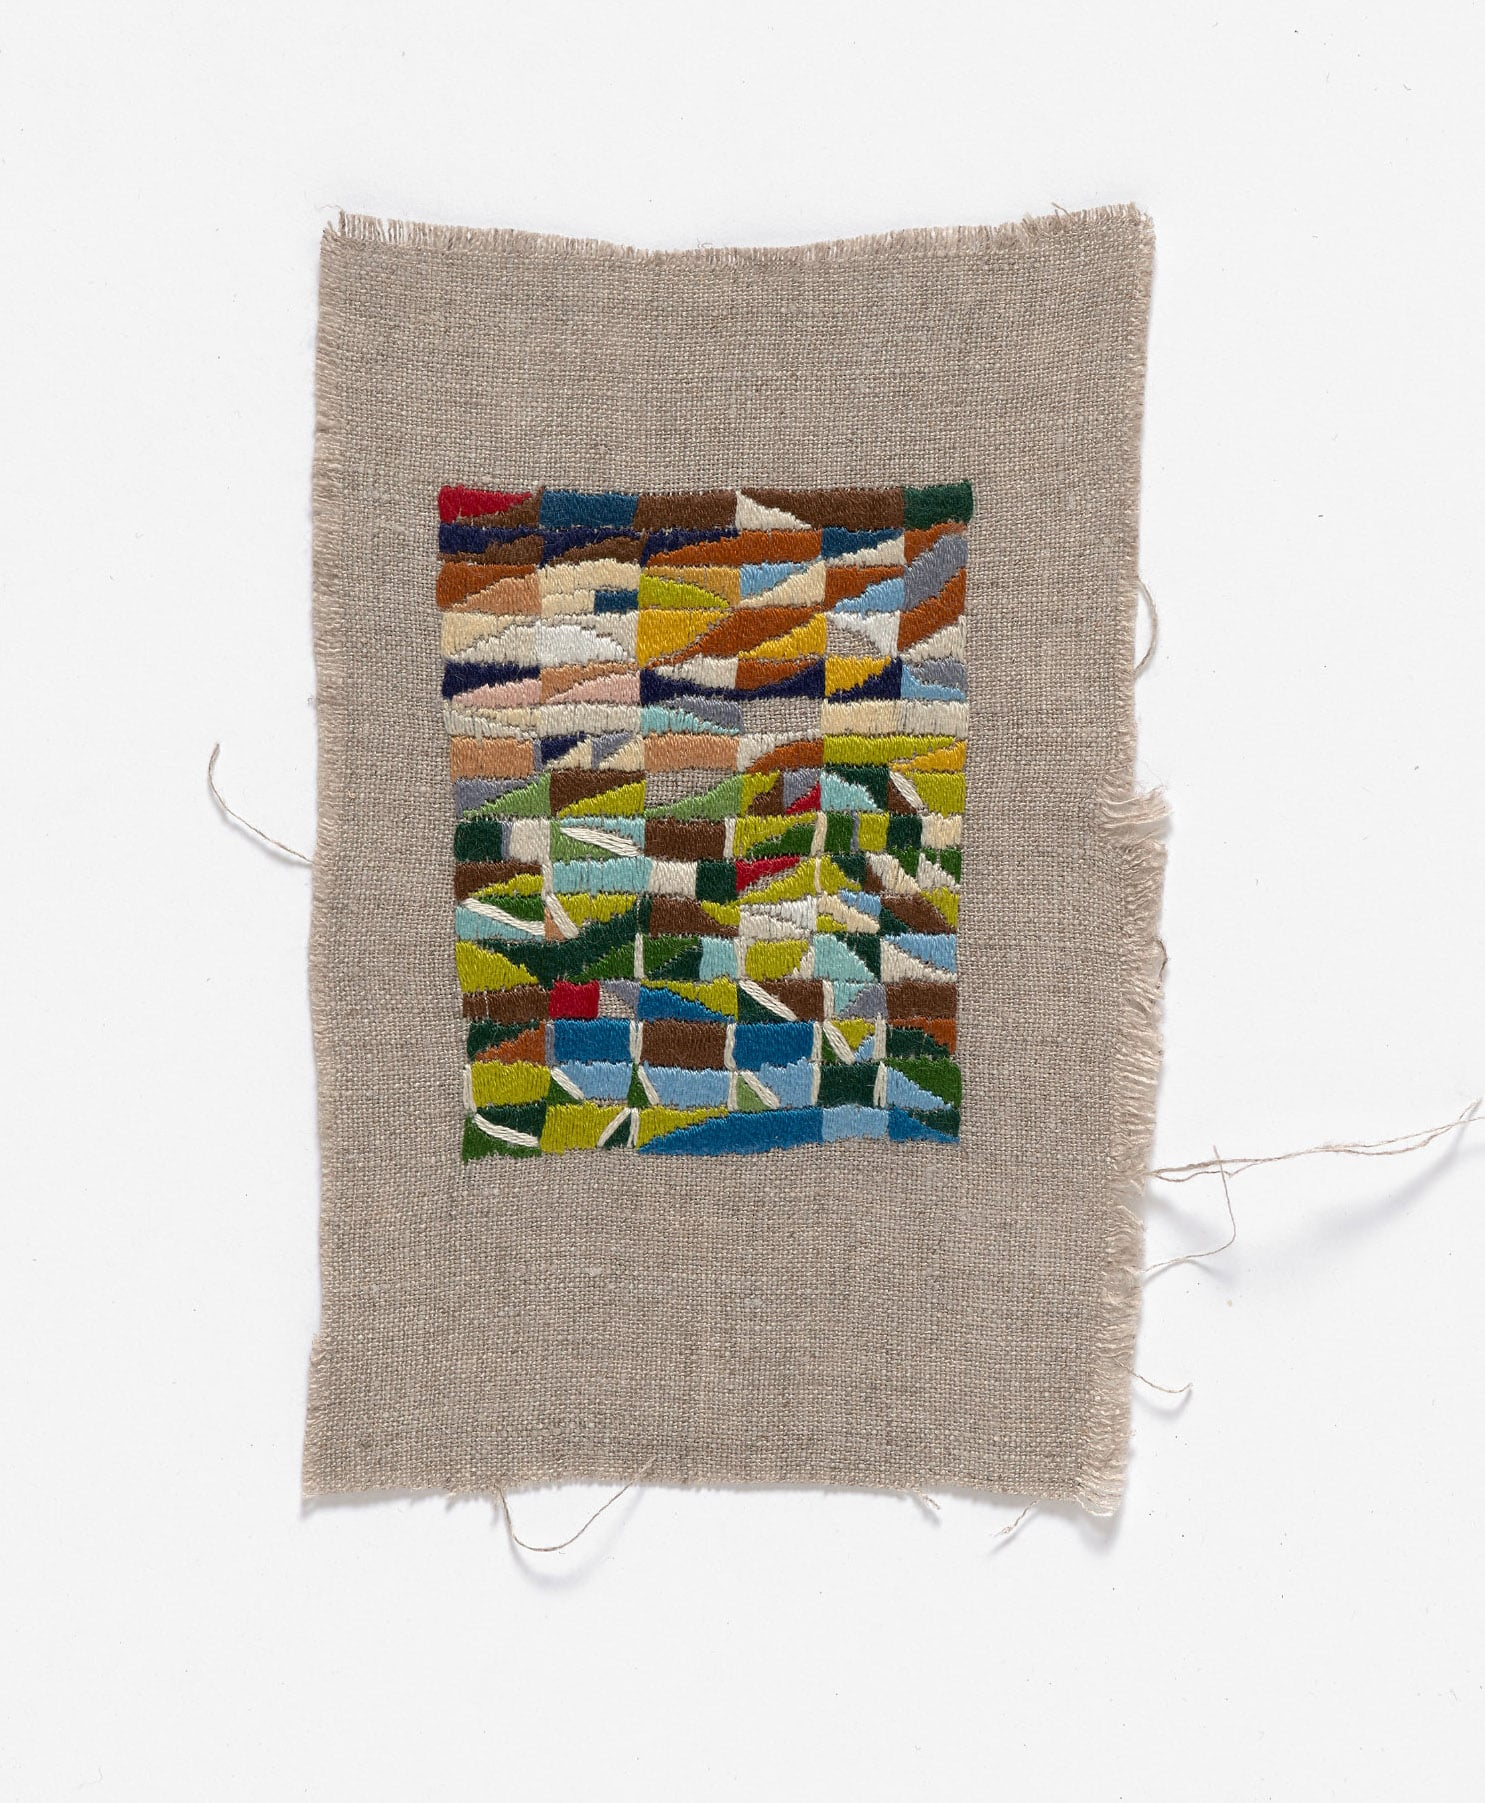 Longridge  2014 Cotton thread on linen 15 x 17cm